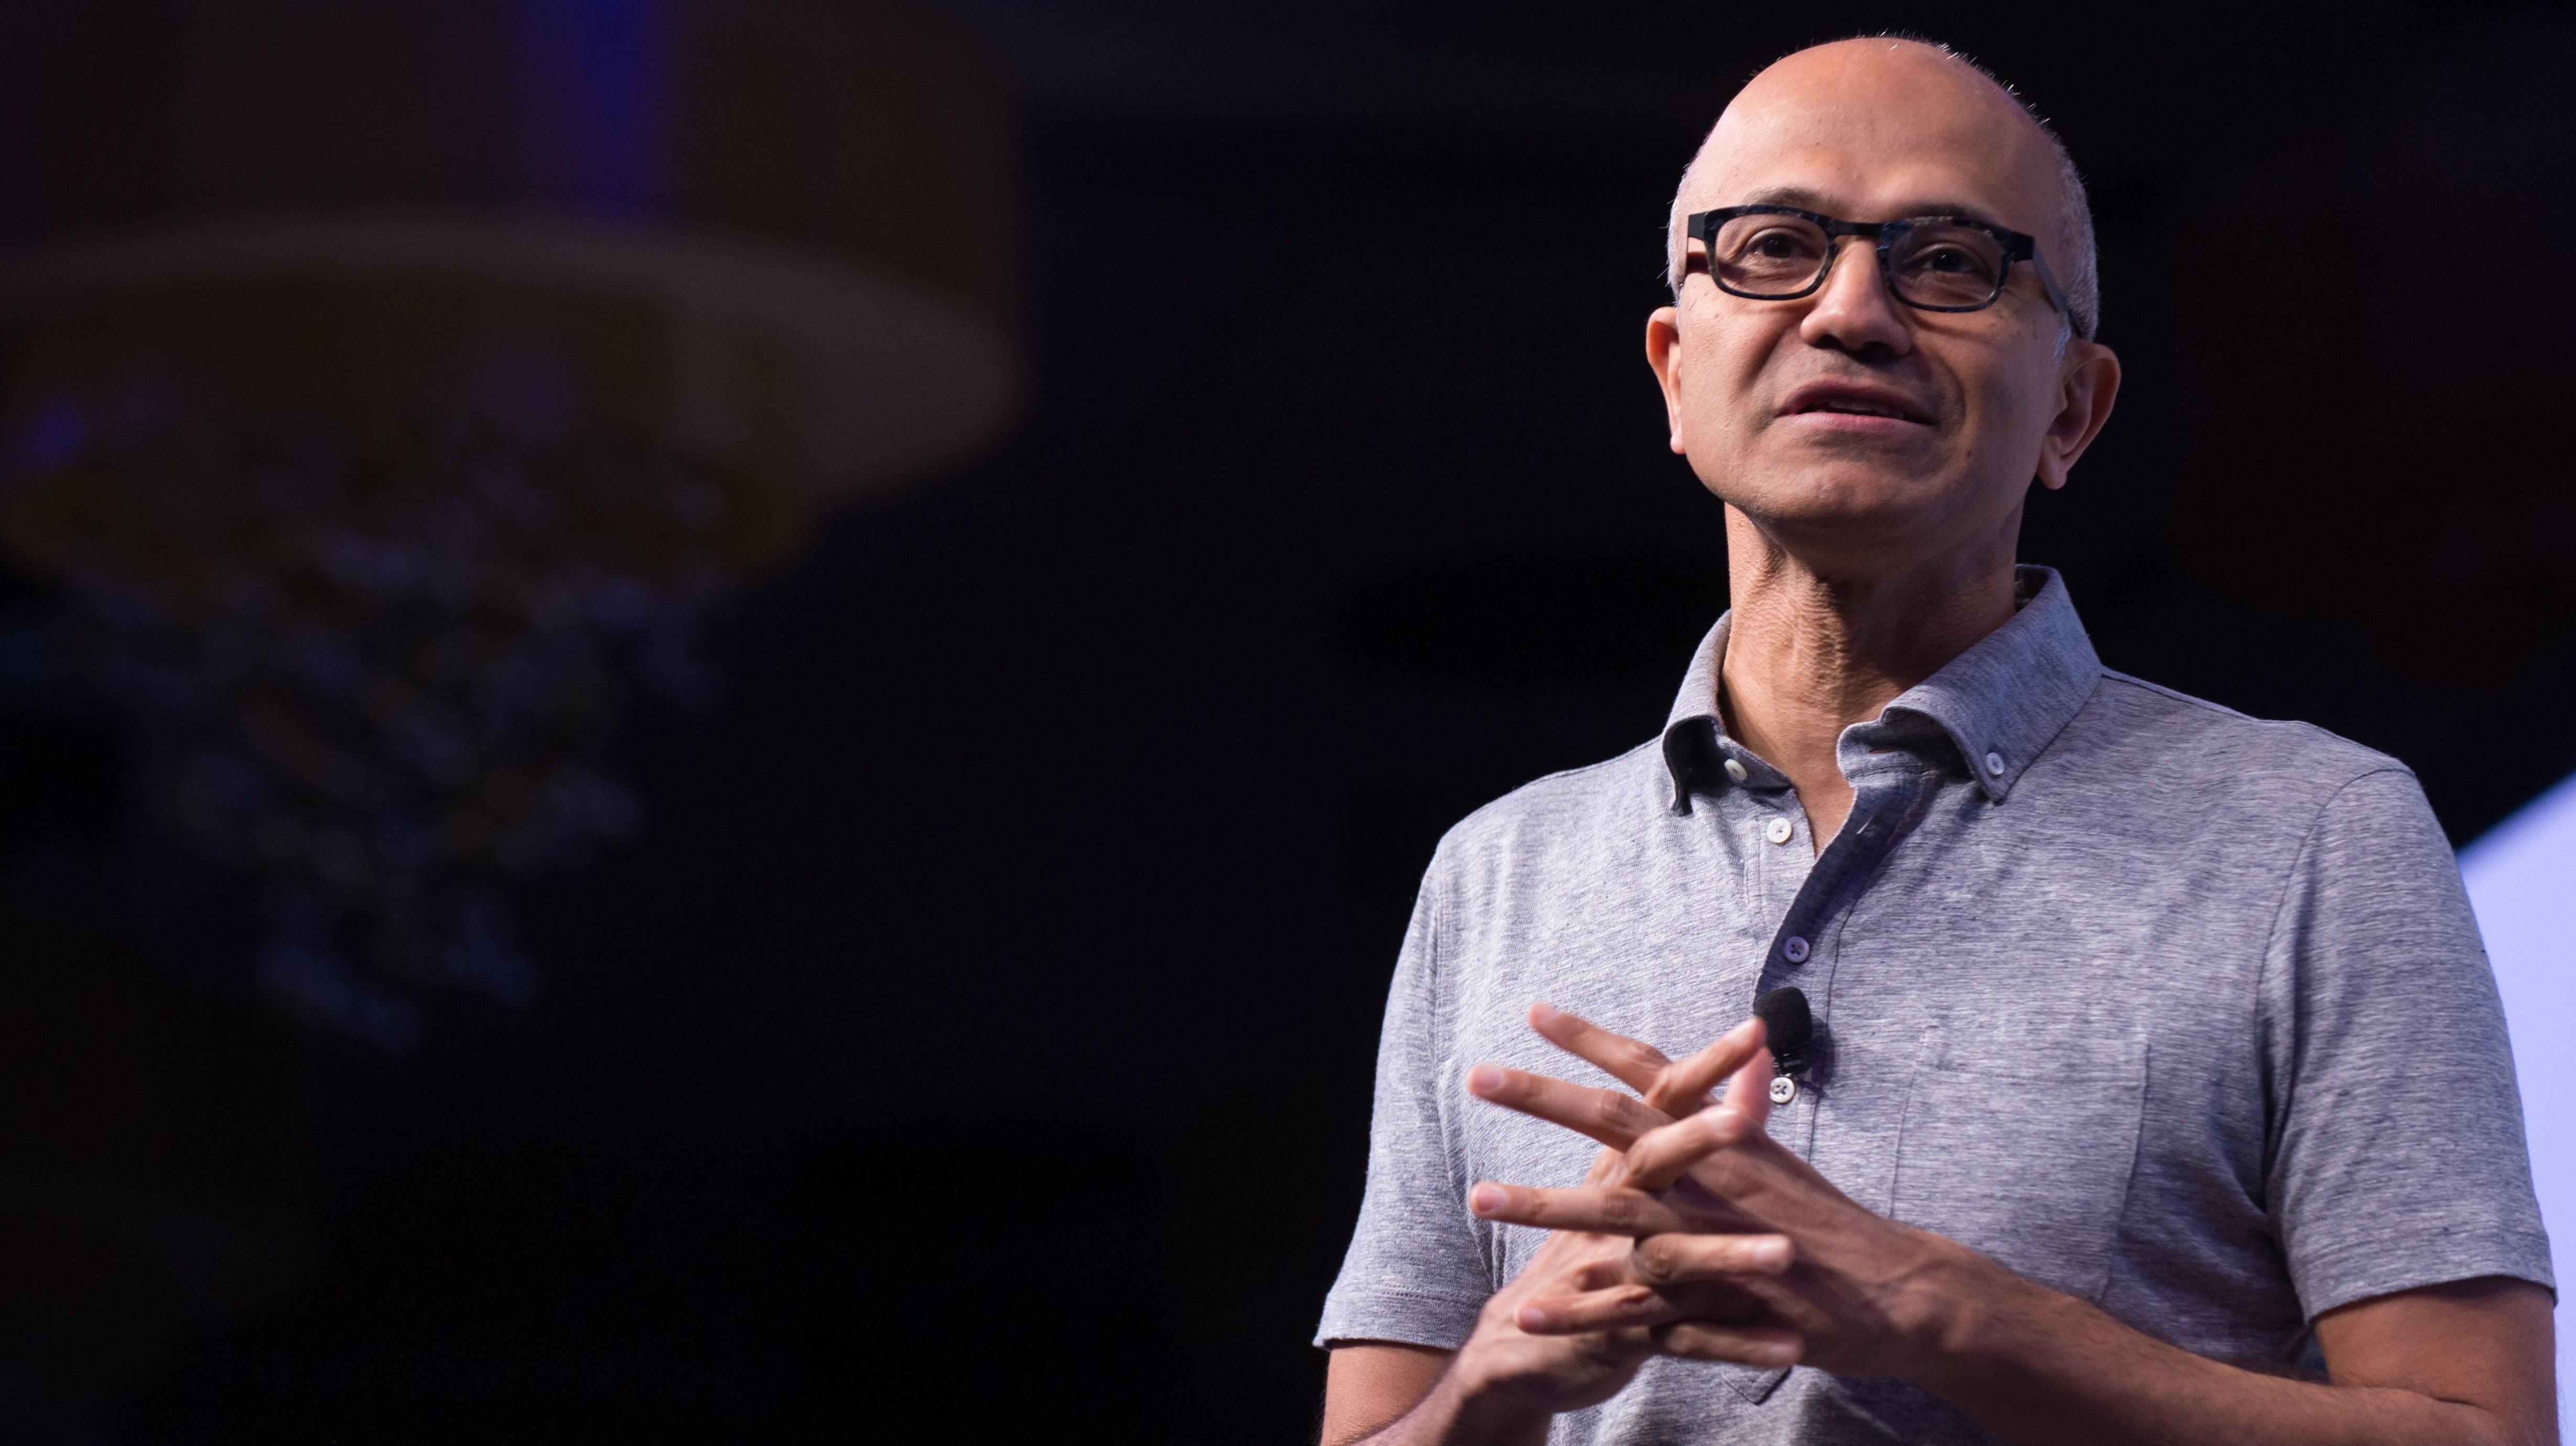 How Microsoft CEO Satya Nadella rebuilt the company culture